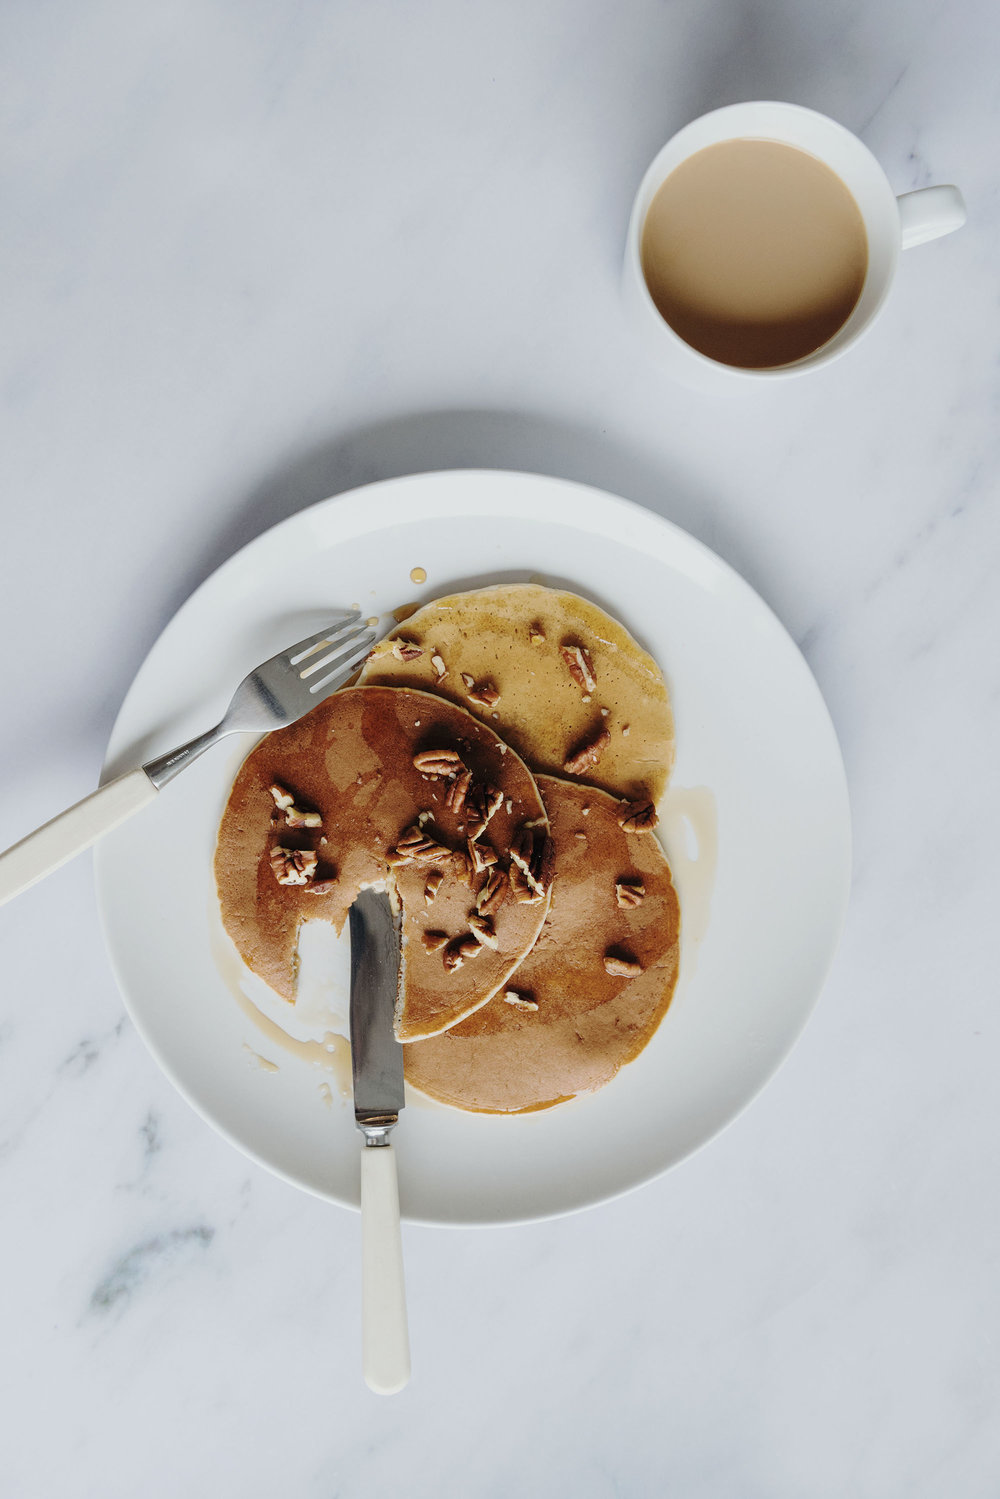 ragnhild-utne-eatbud-eat-bud-banana-pancakes-recipe-healthy-food-blog-2.jpg